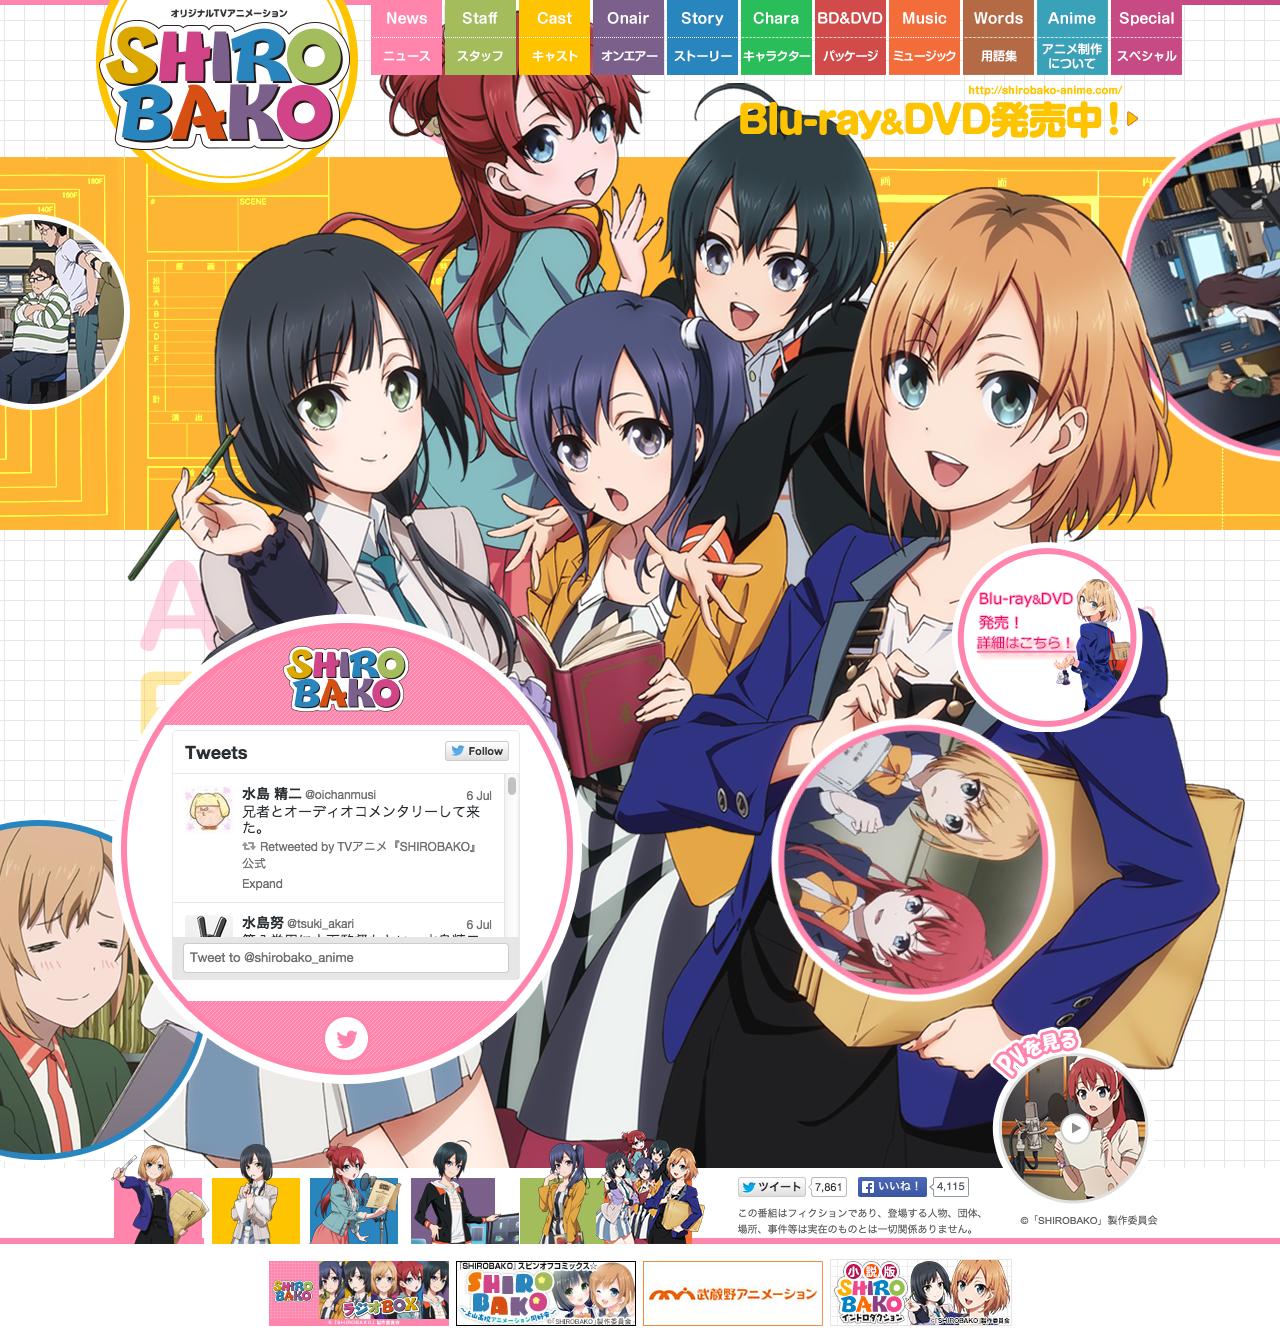 tvアニメ shirobako 公式サイト バナーデザイン アニメ デザイン